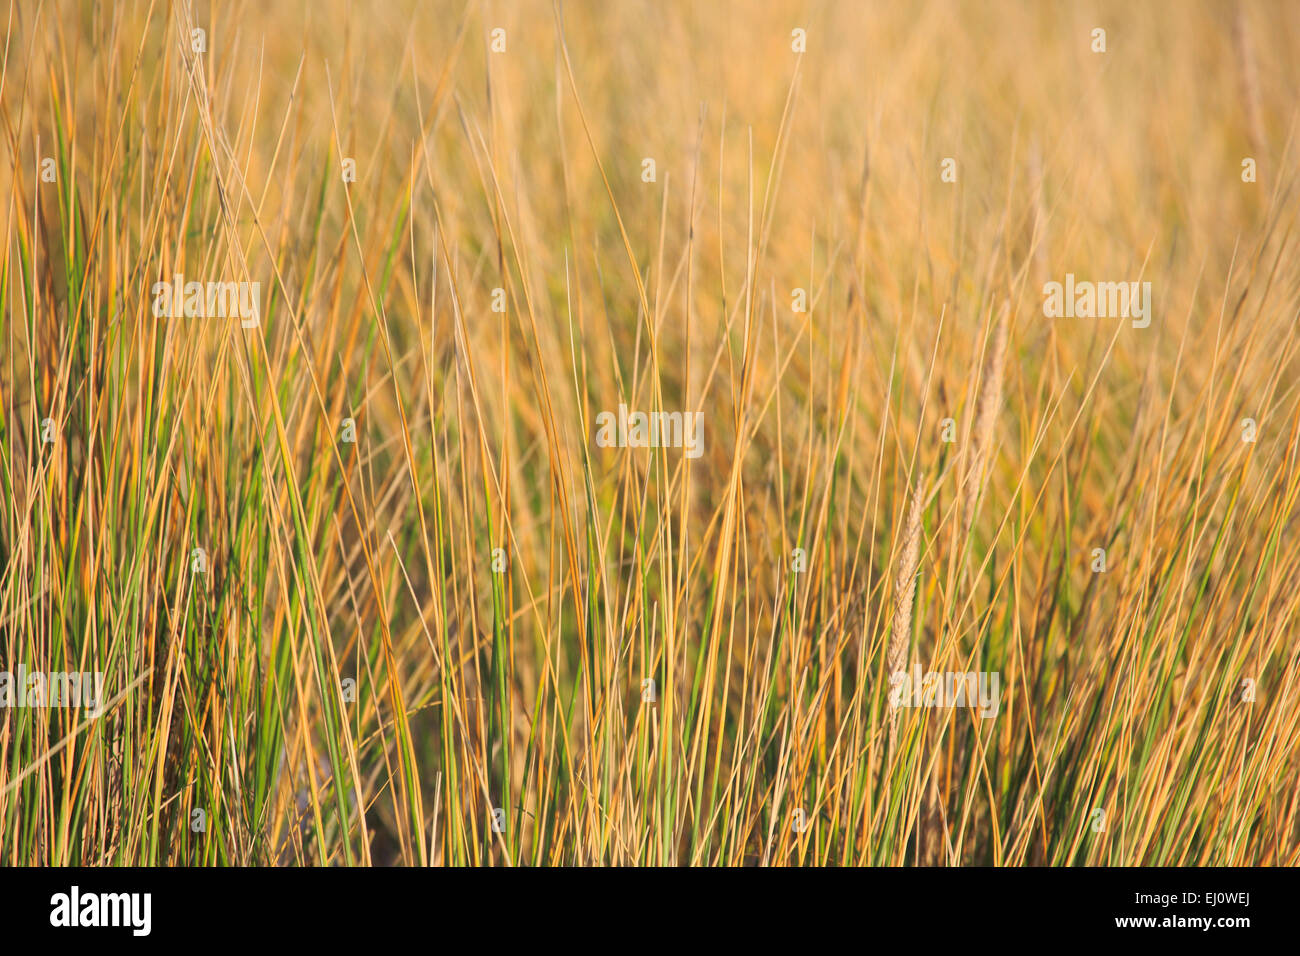 Germany, Europe, dune, dune grass, blade of grass, Helgoland, coastal vegetation, macro, sea, seashore, pattern, - Stock Image